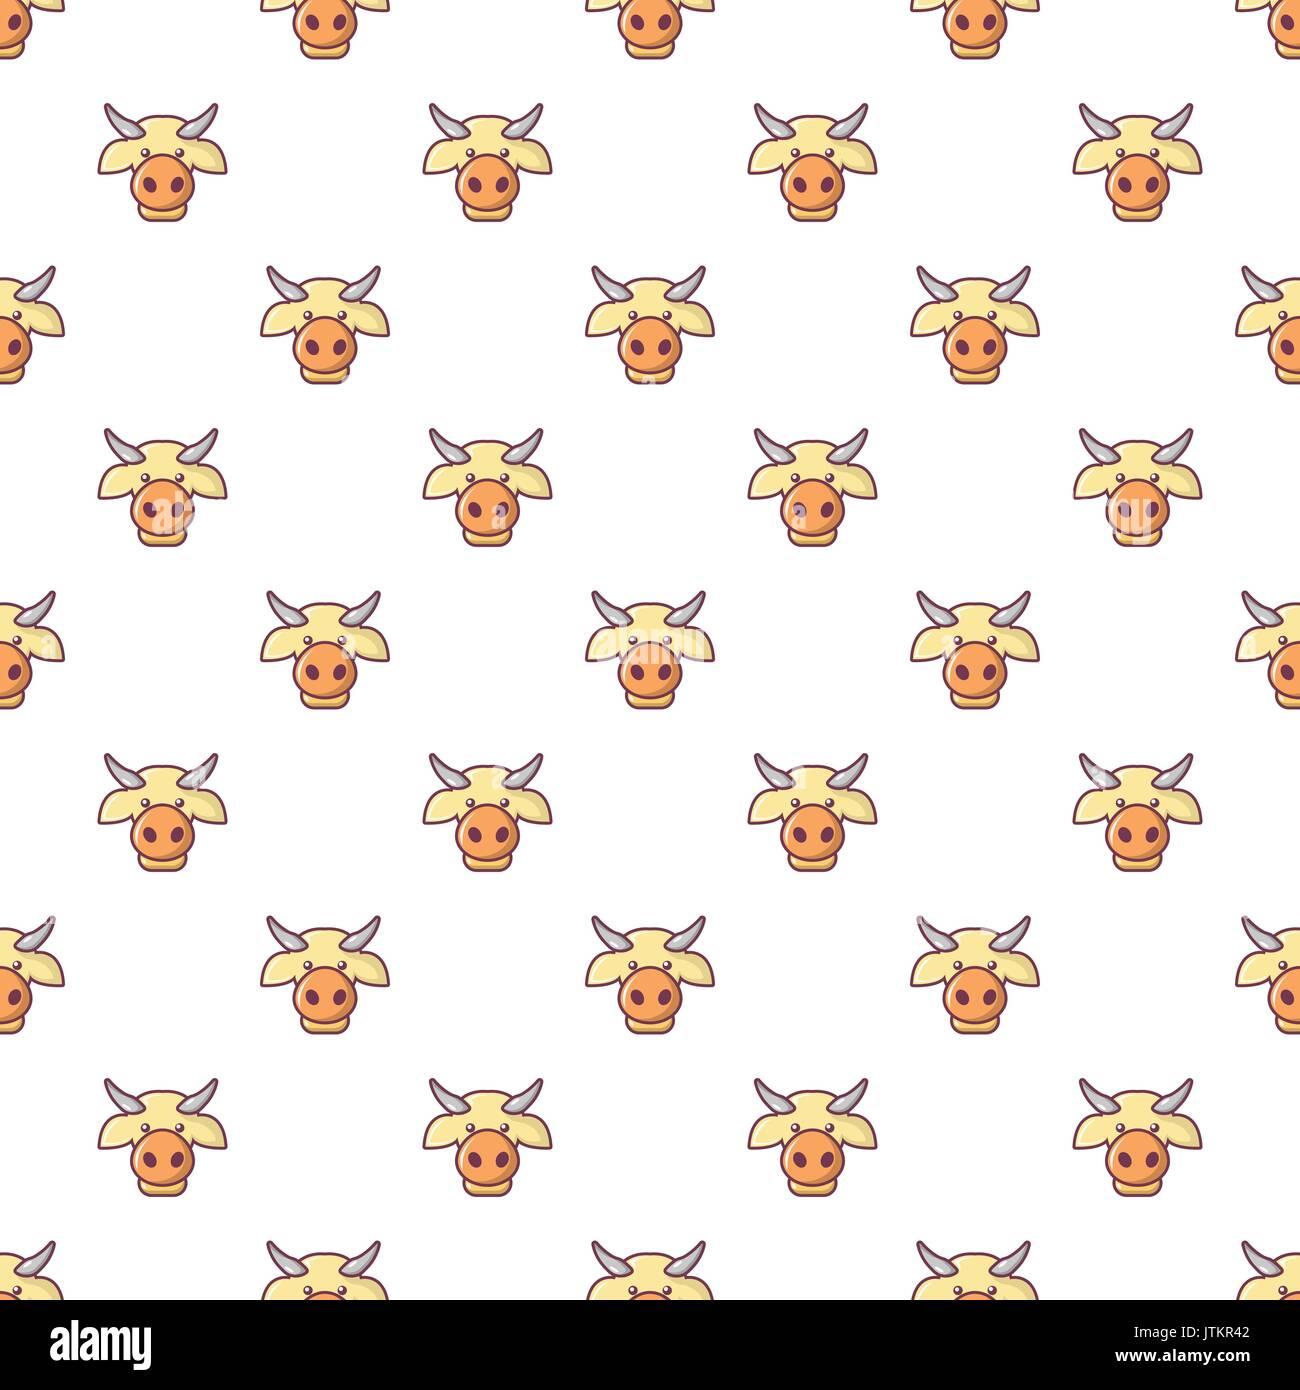 cow head pattern seamless stock vector art illustration vector